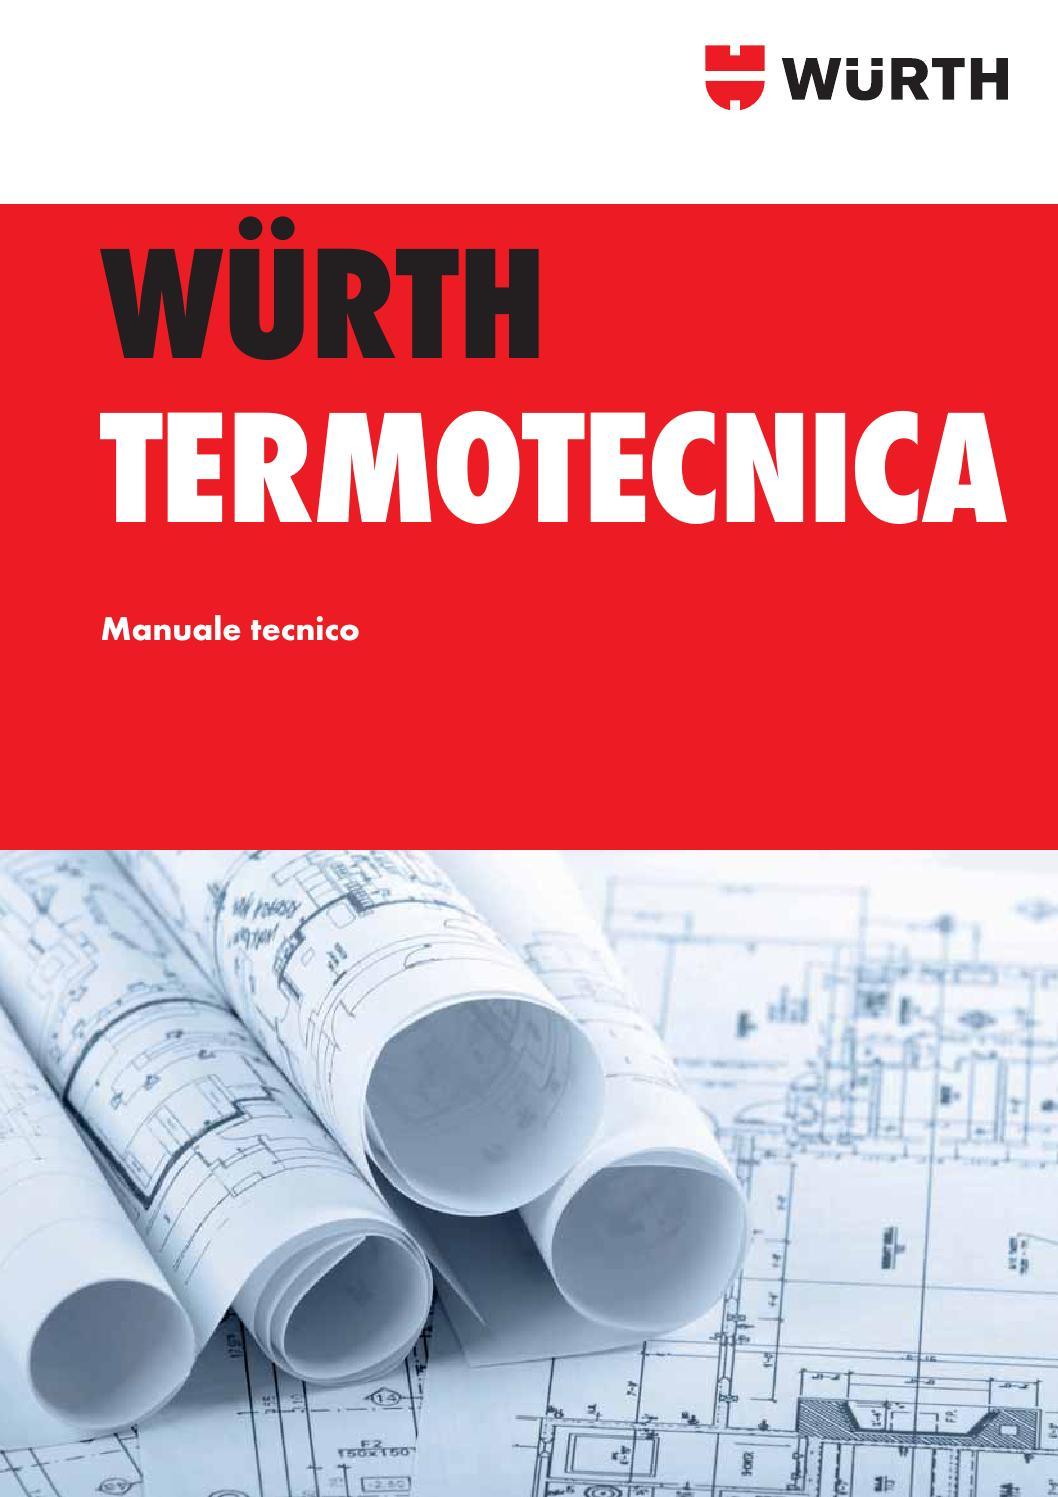 wurth termotecnica manuale tecnico by w rth italia issuu